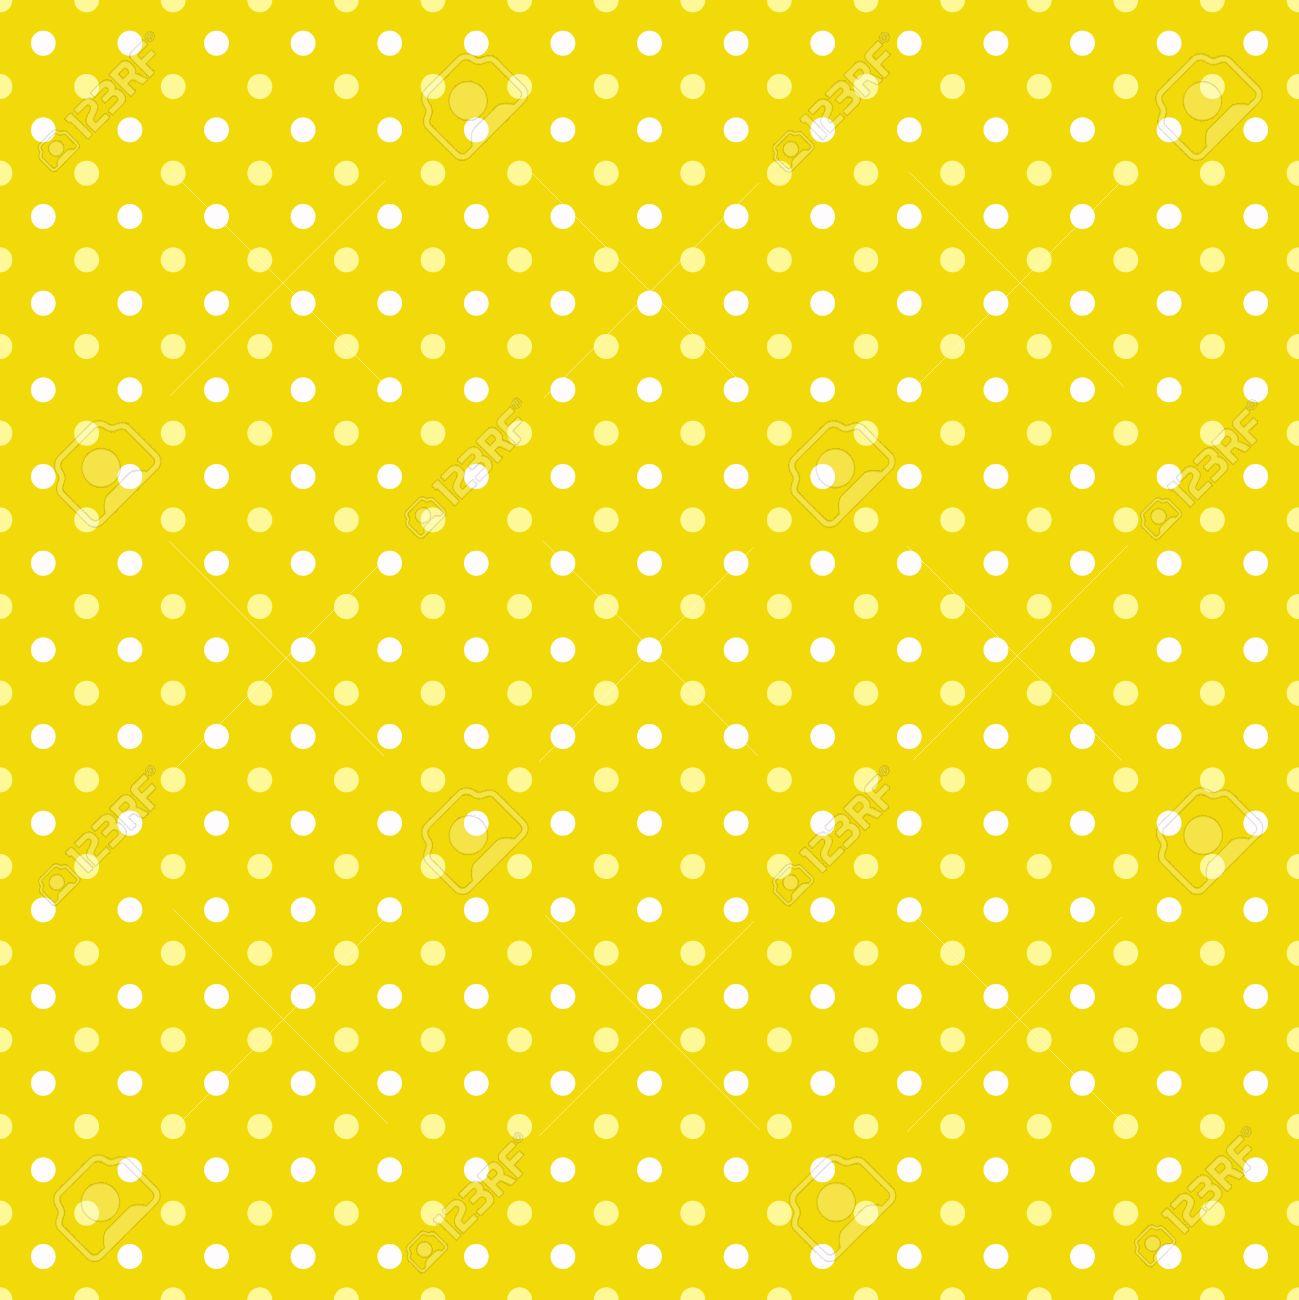 yellow polka dot background